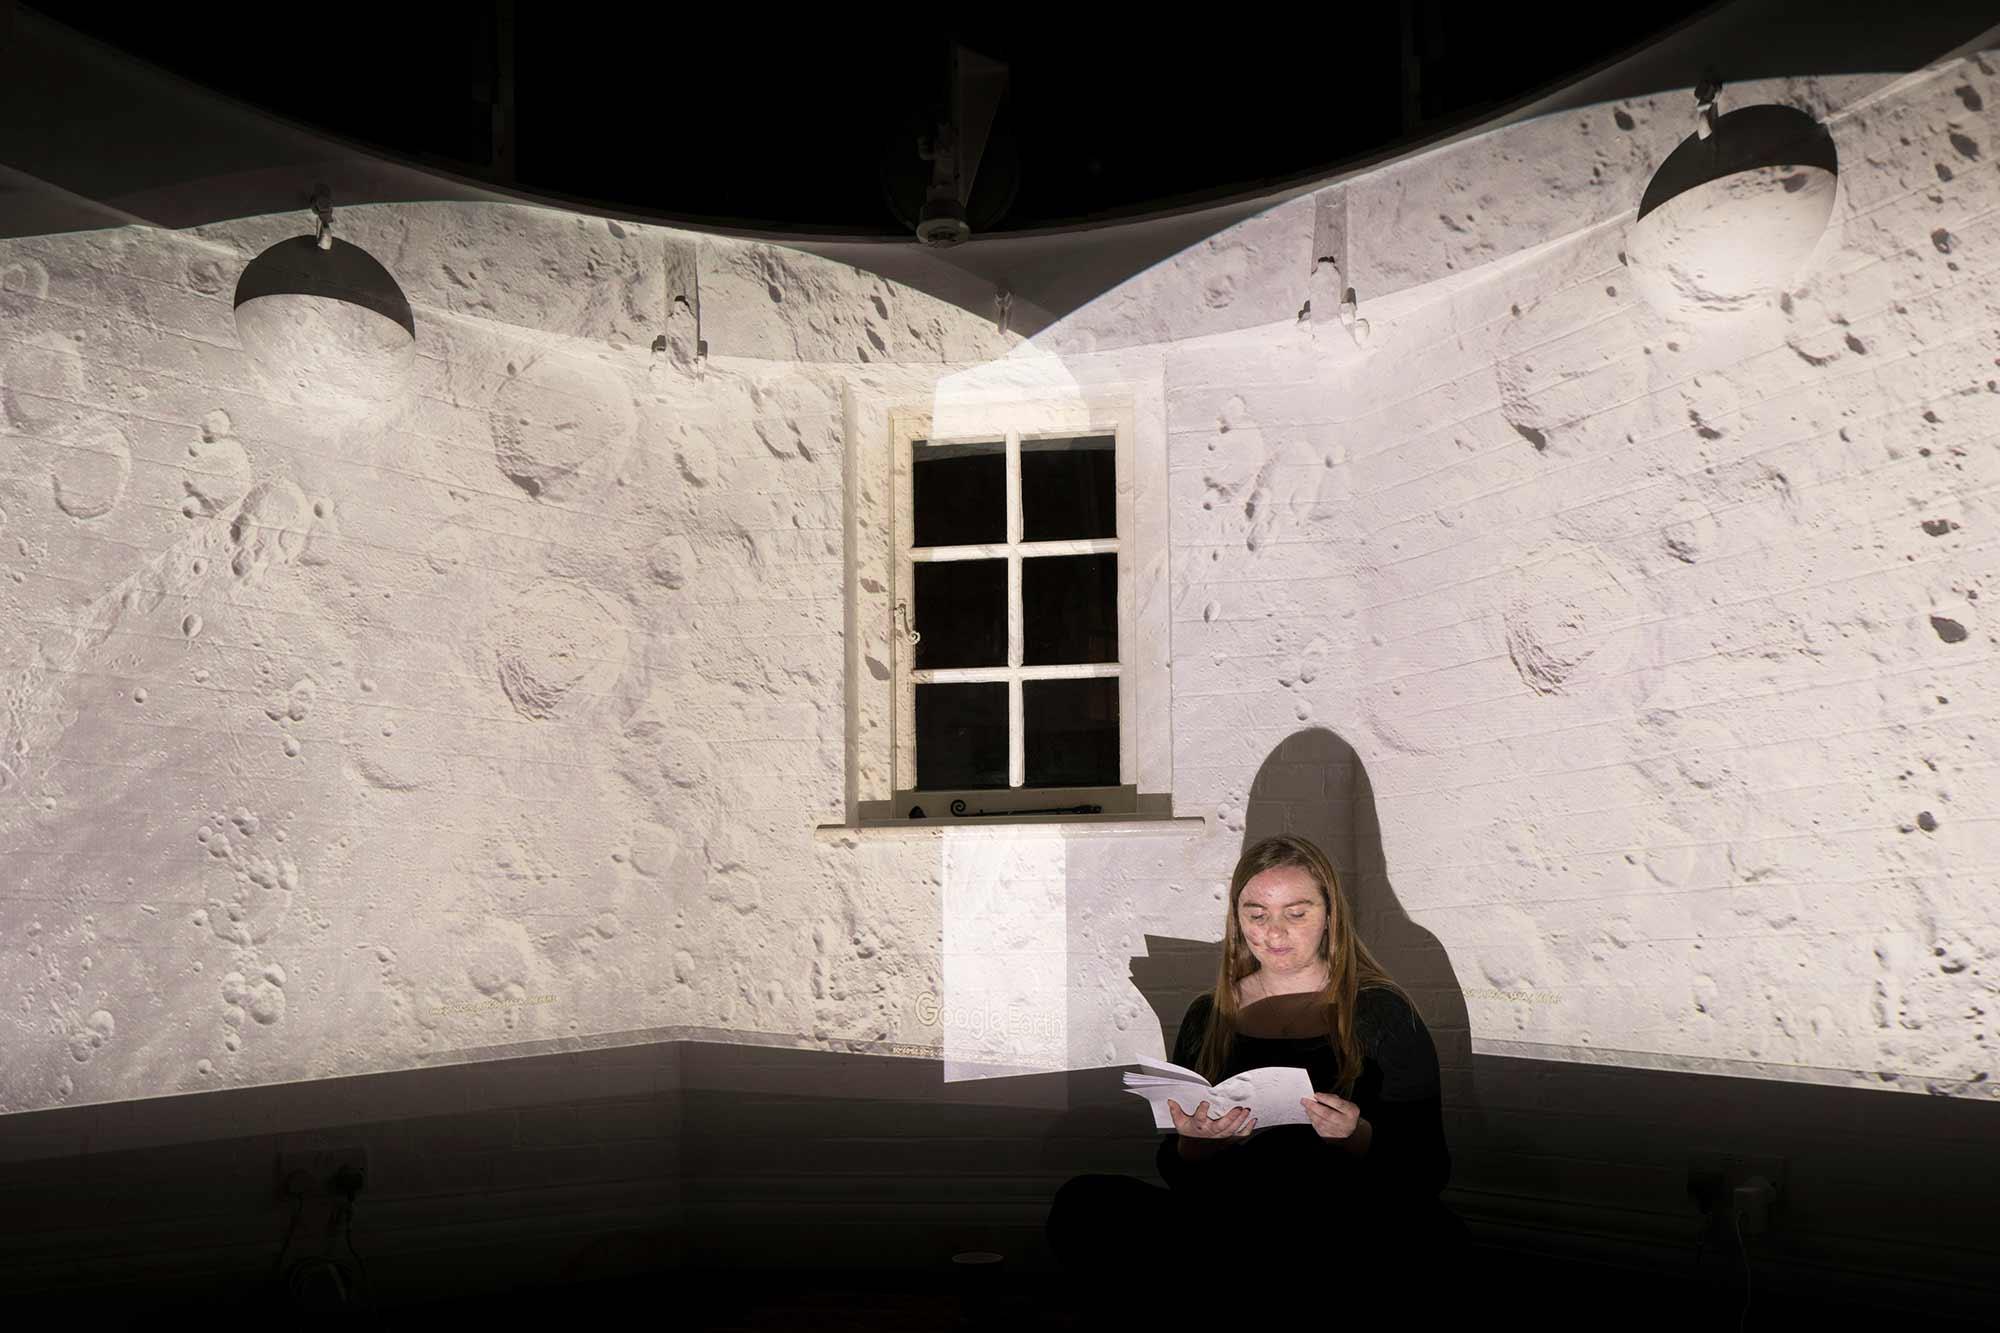 A Lunar Perspective 1:  Photograph by Henrietta Williams